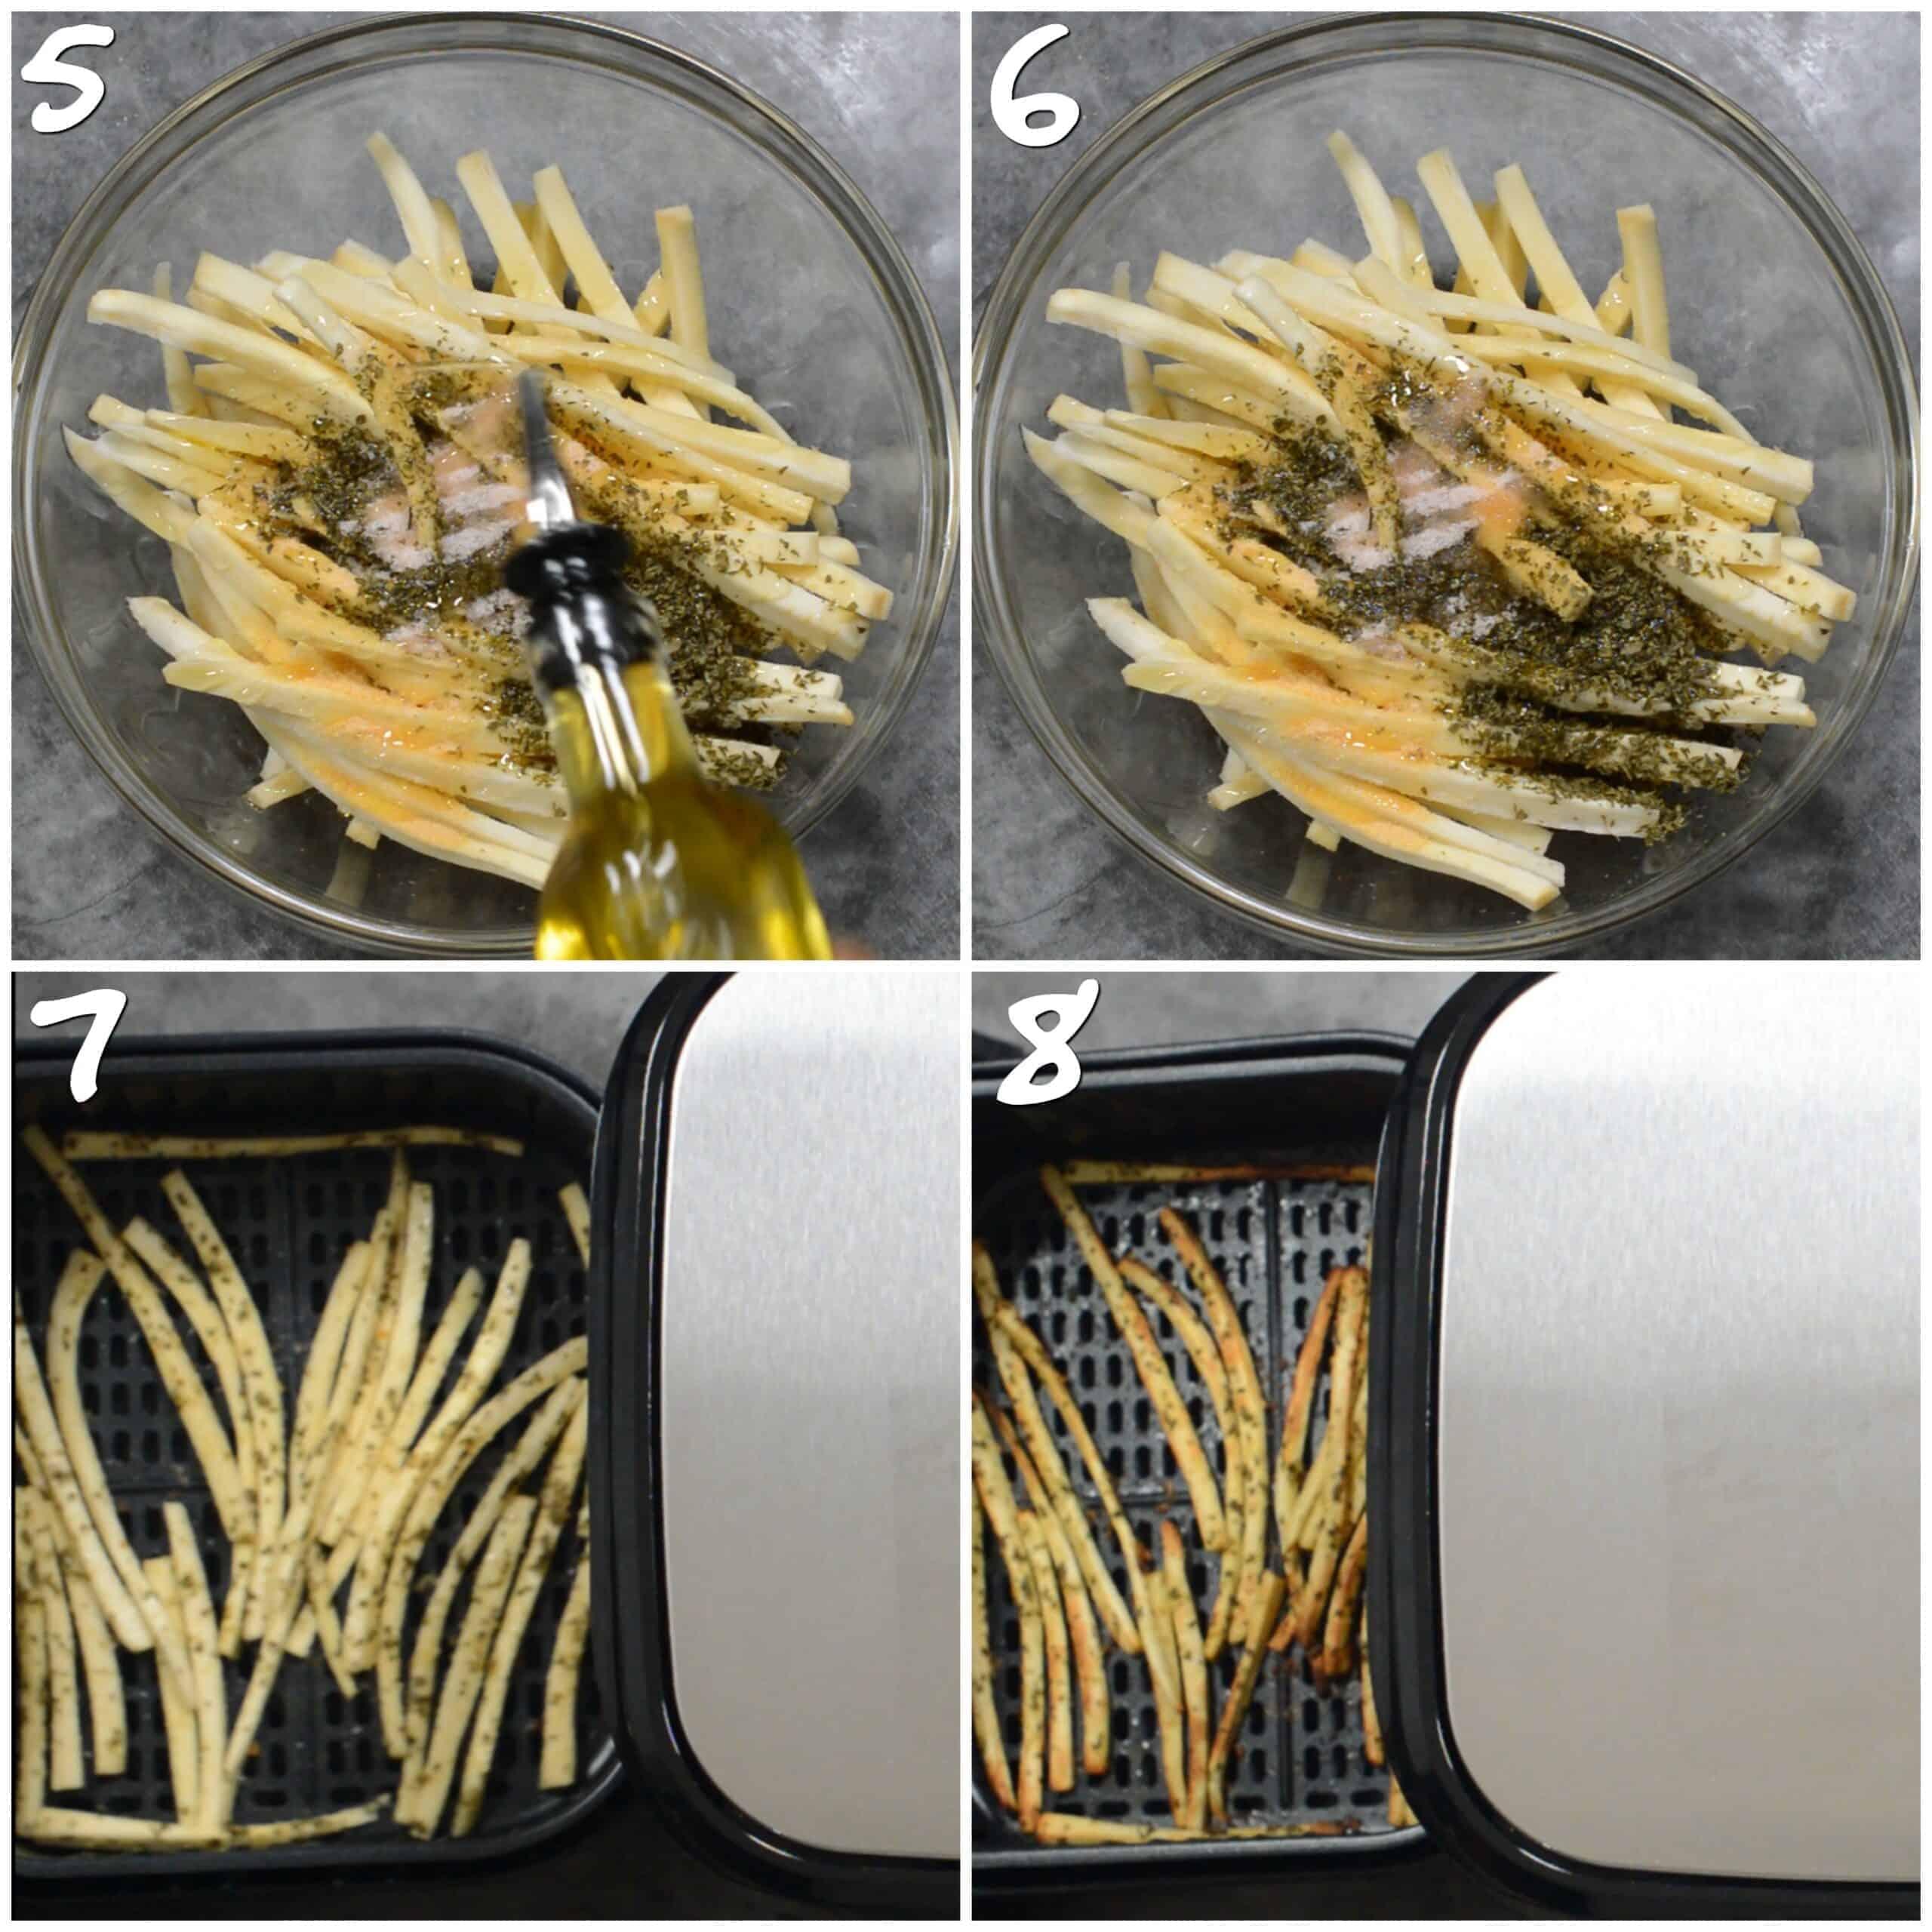 steps5-8 seasoning and air frying